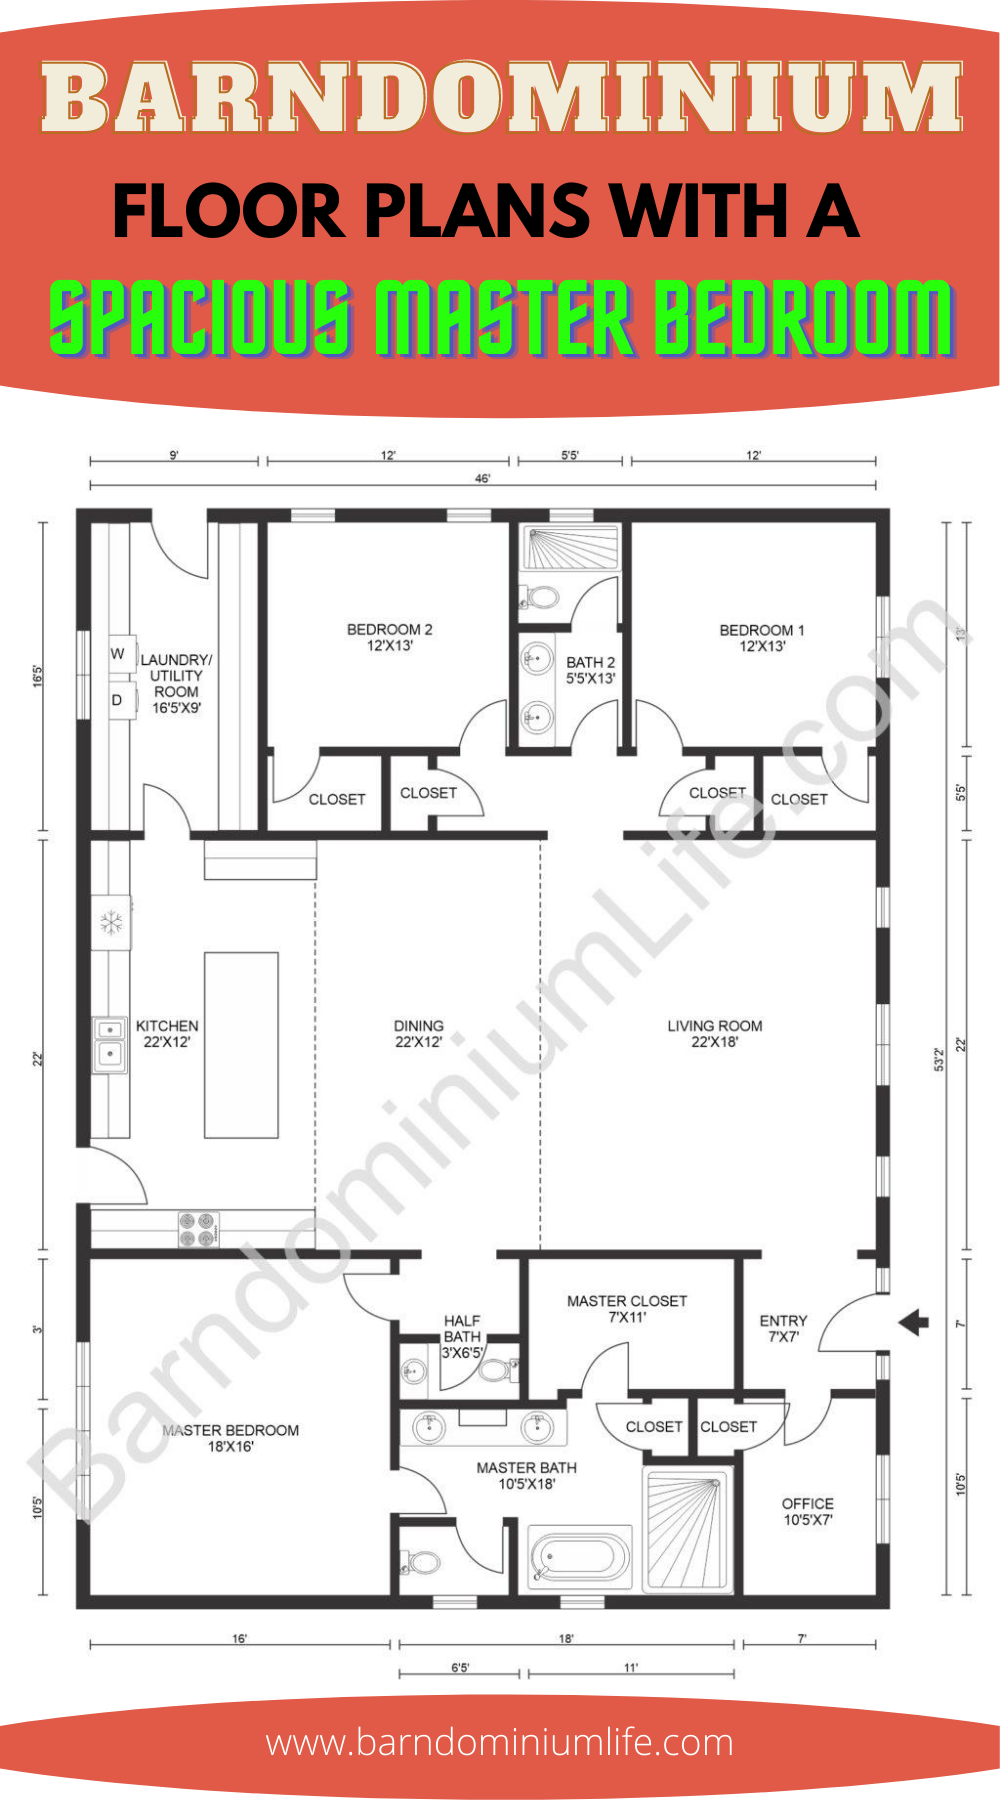 Barndominium Floor Plans with a Spacious Master Be